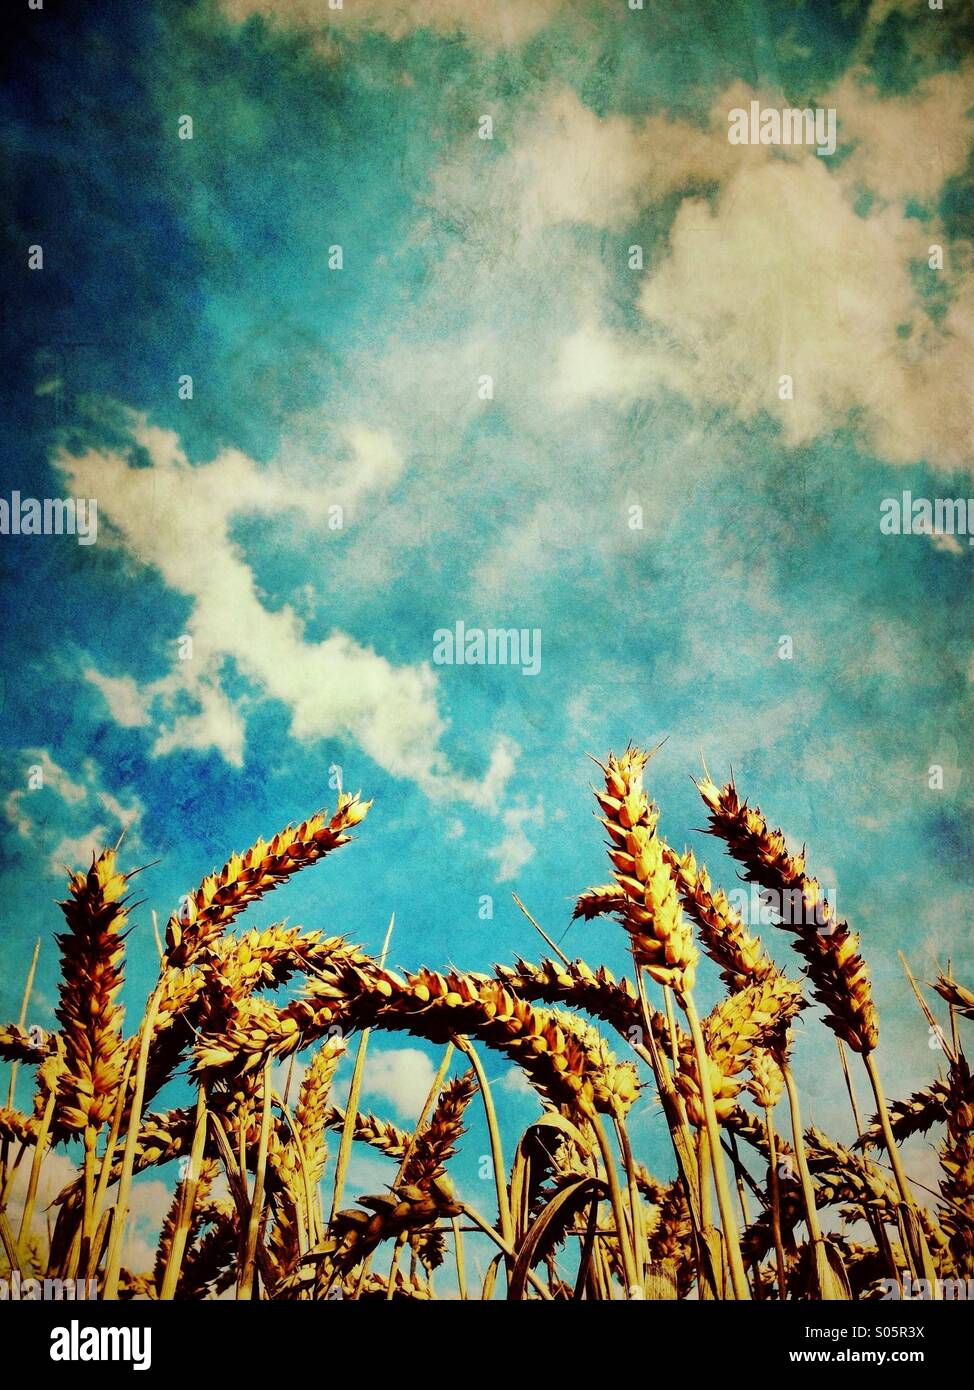 Reife Weizen gegen blauen Himmel Stockbild